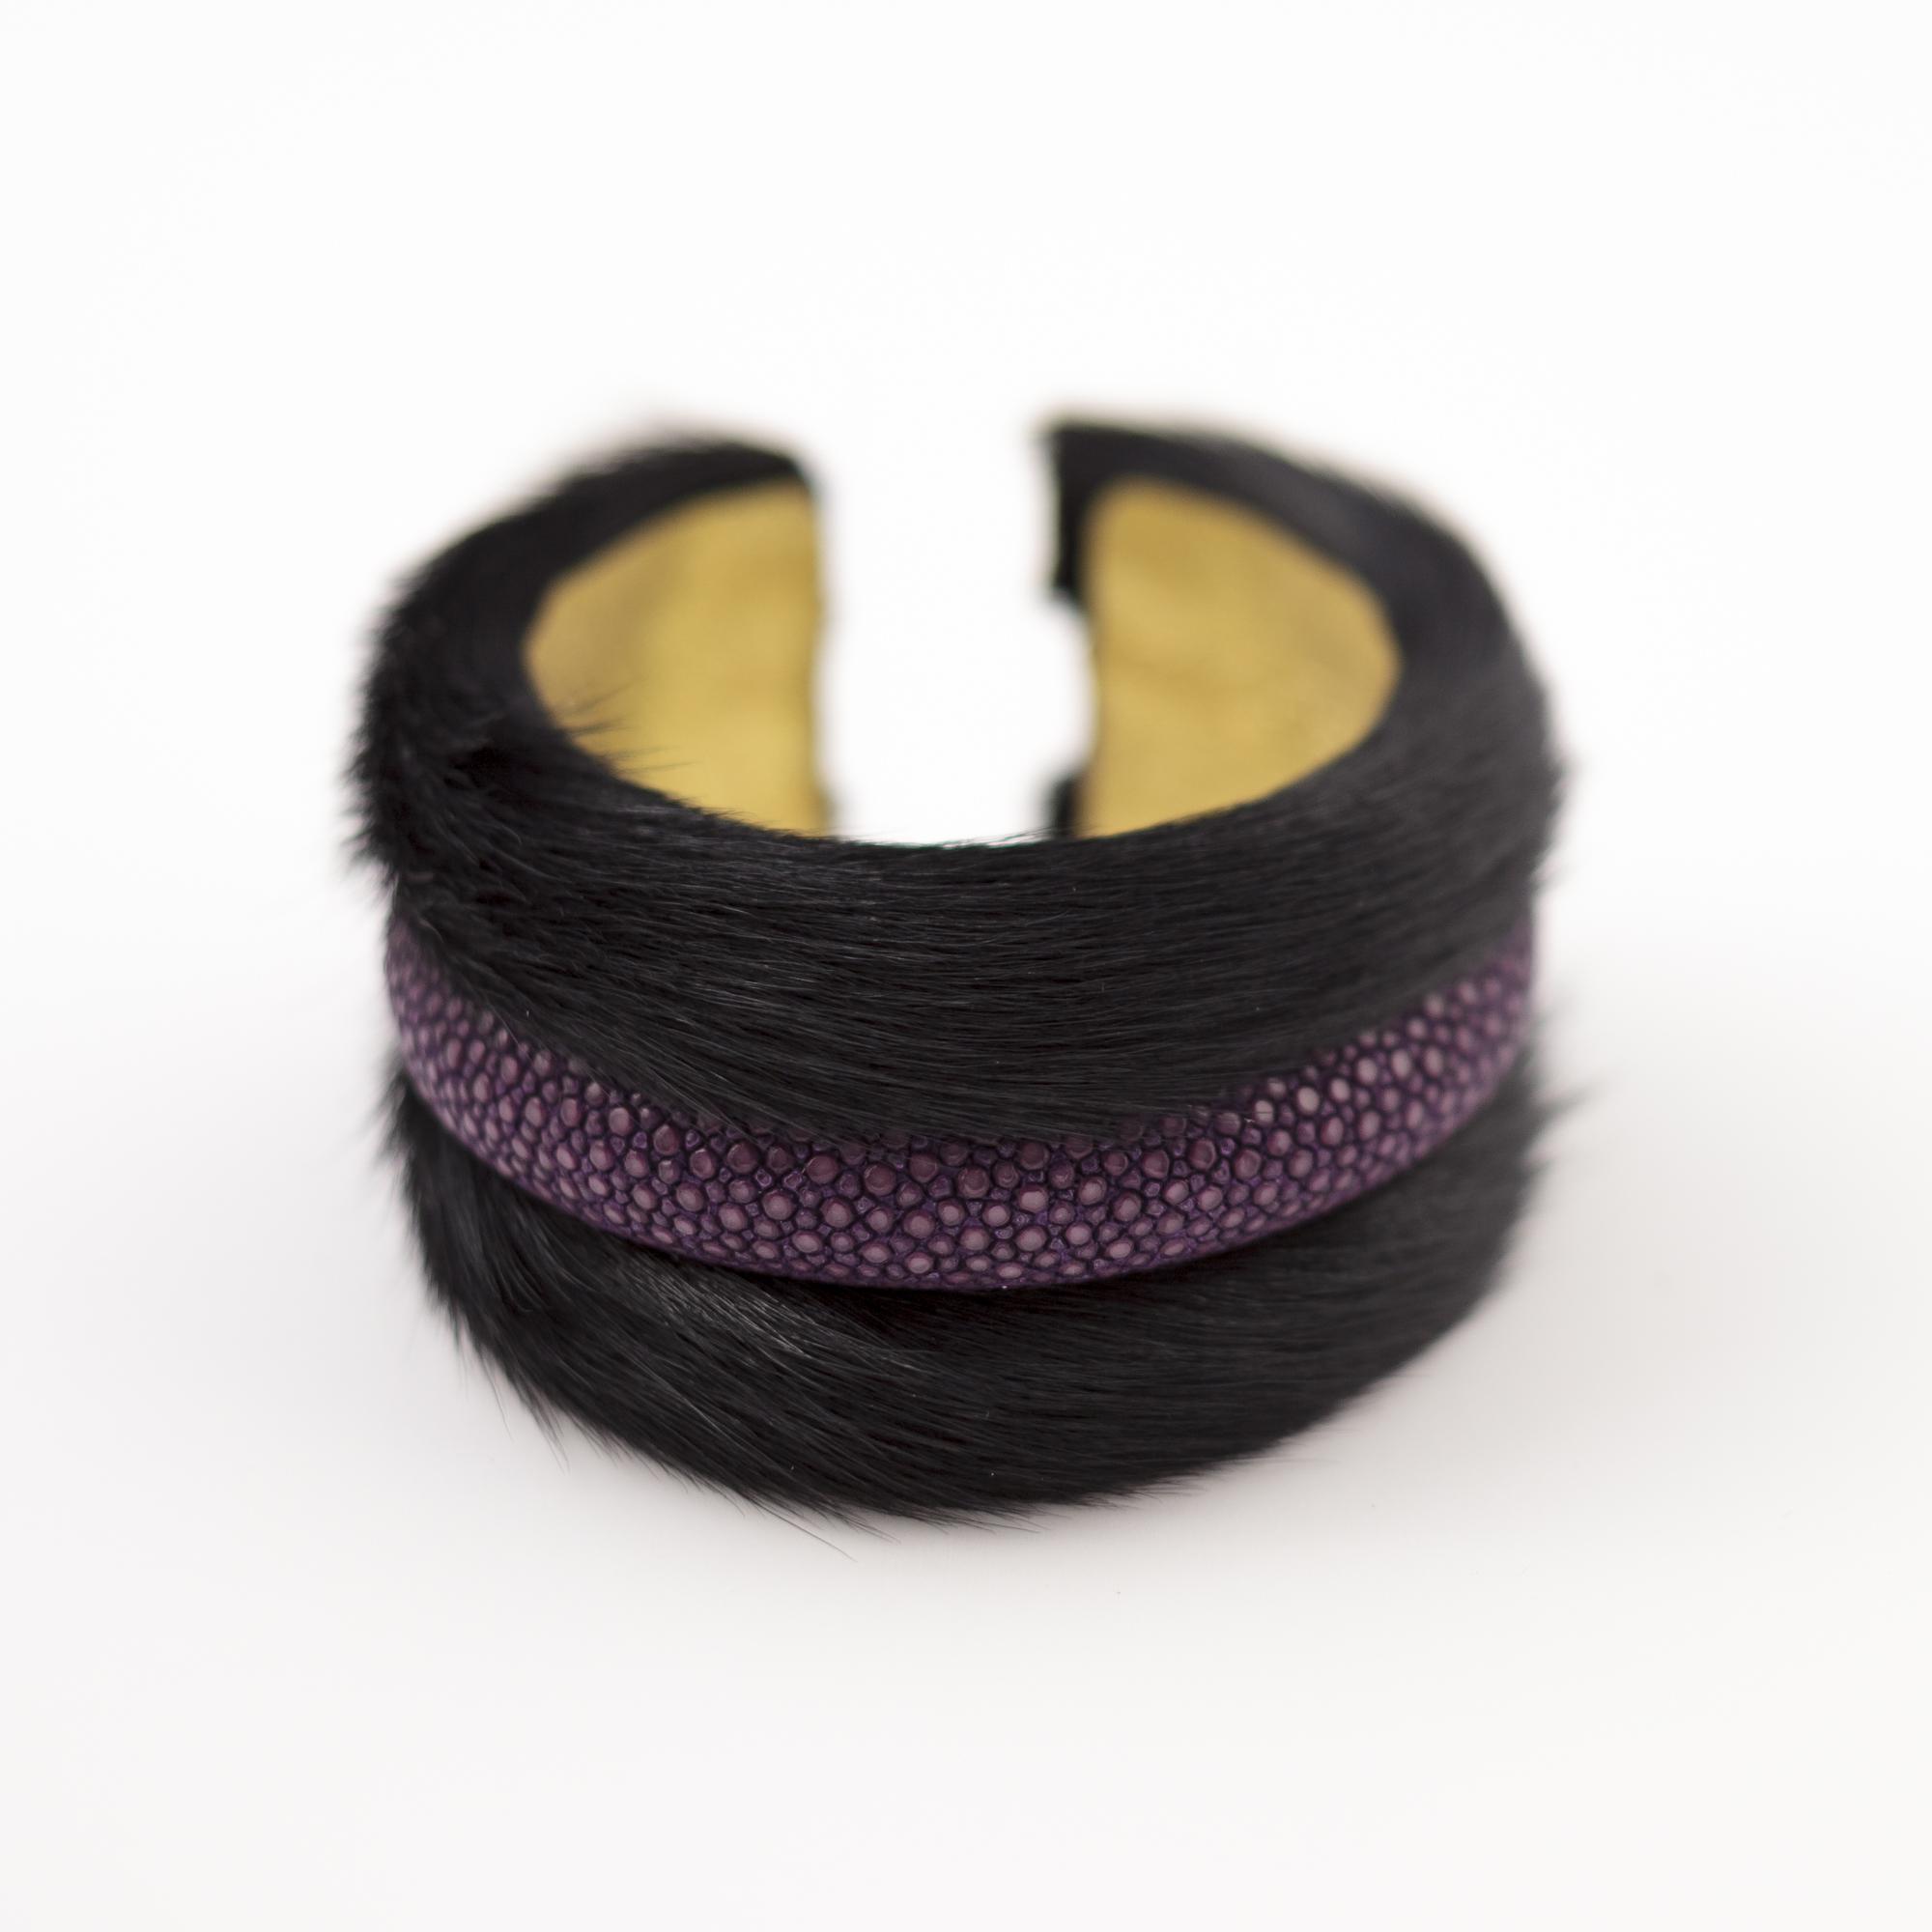 tresor-by-flore-galuchat-bracelet-poilu-noir-violet